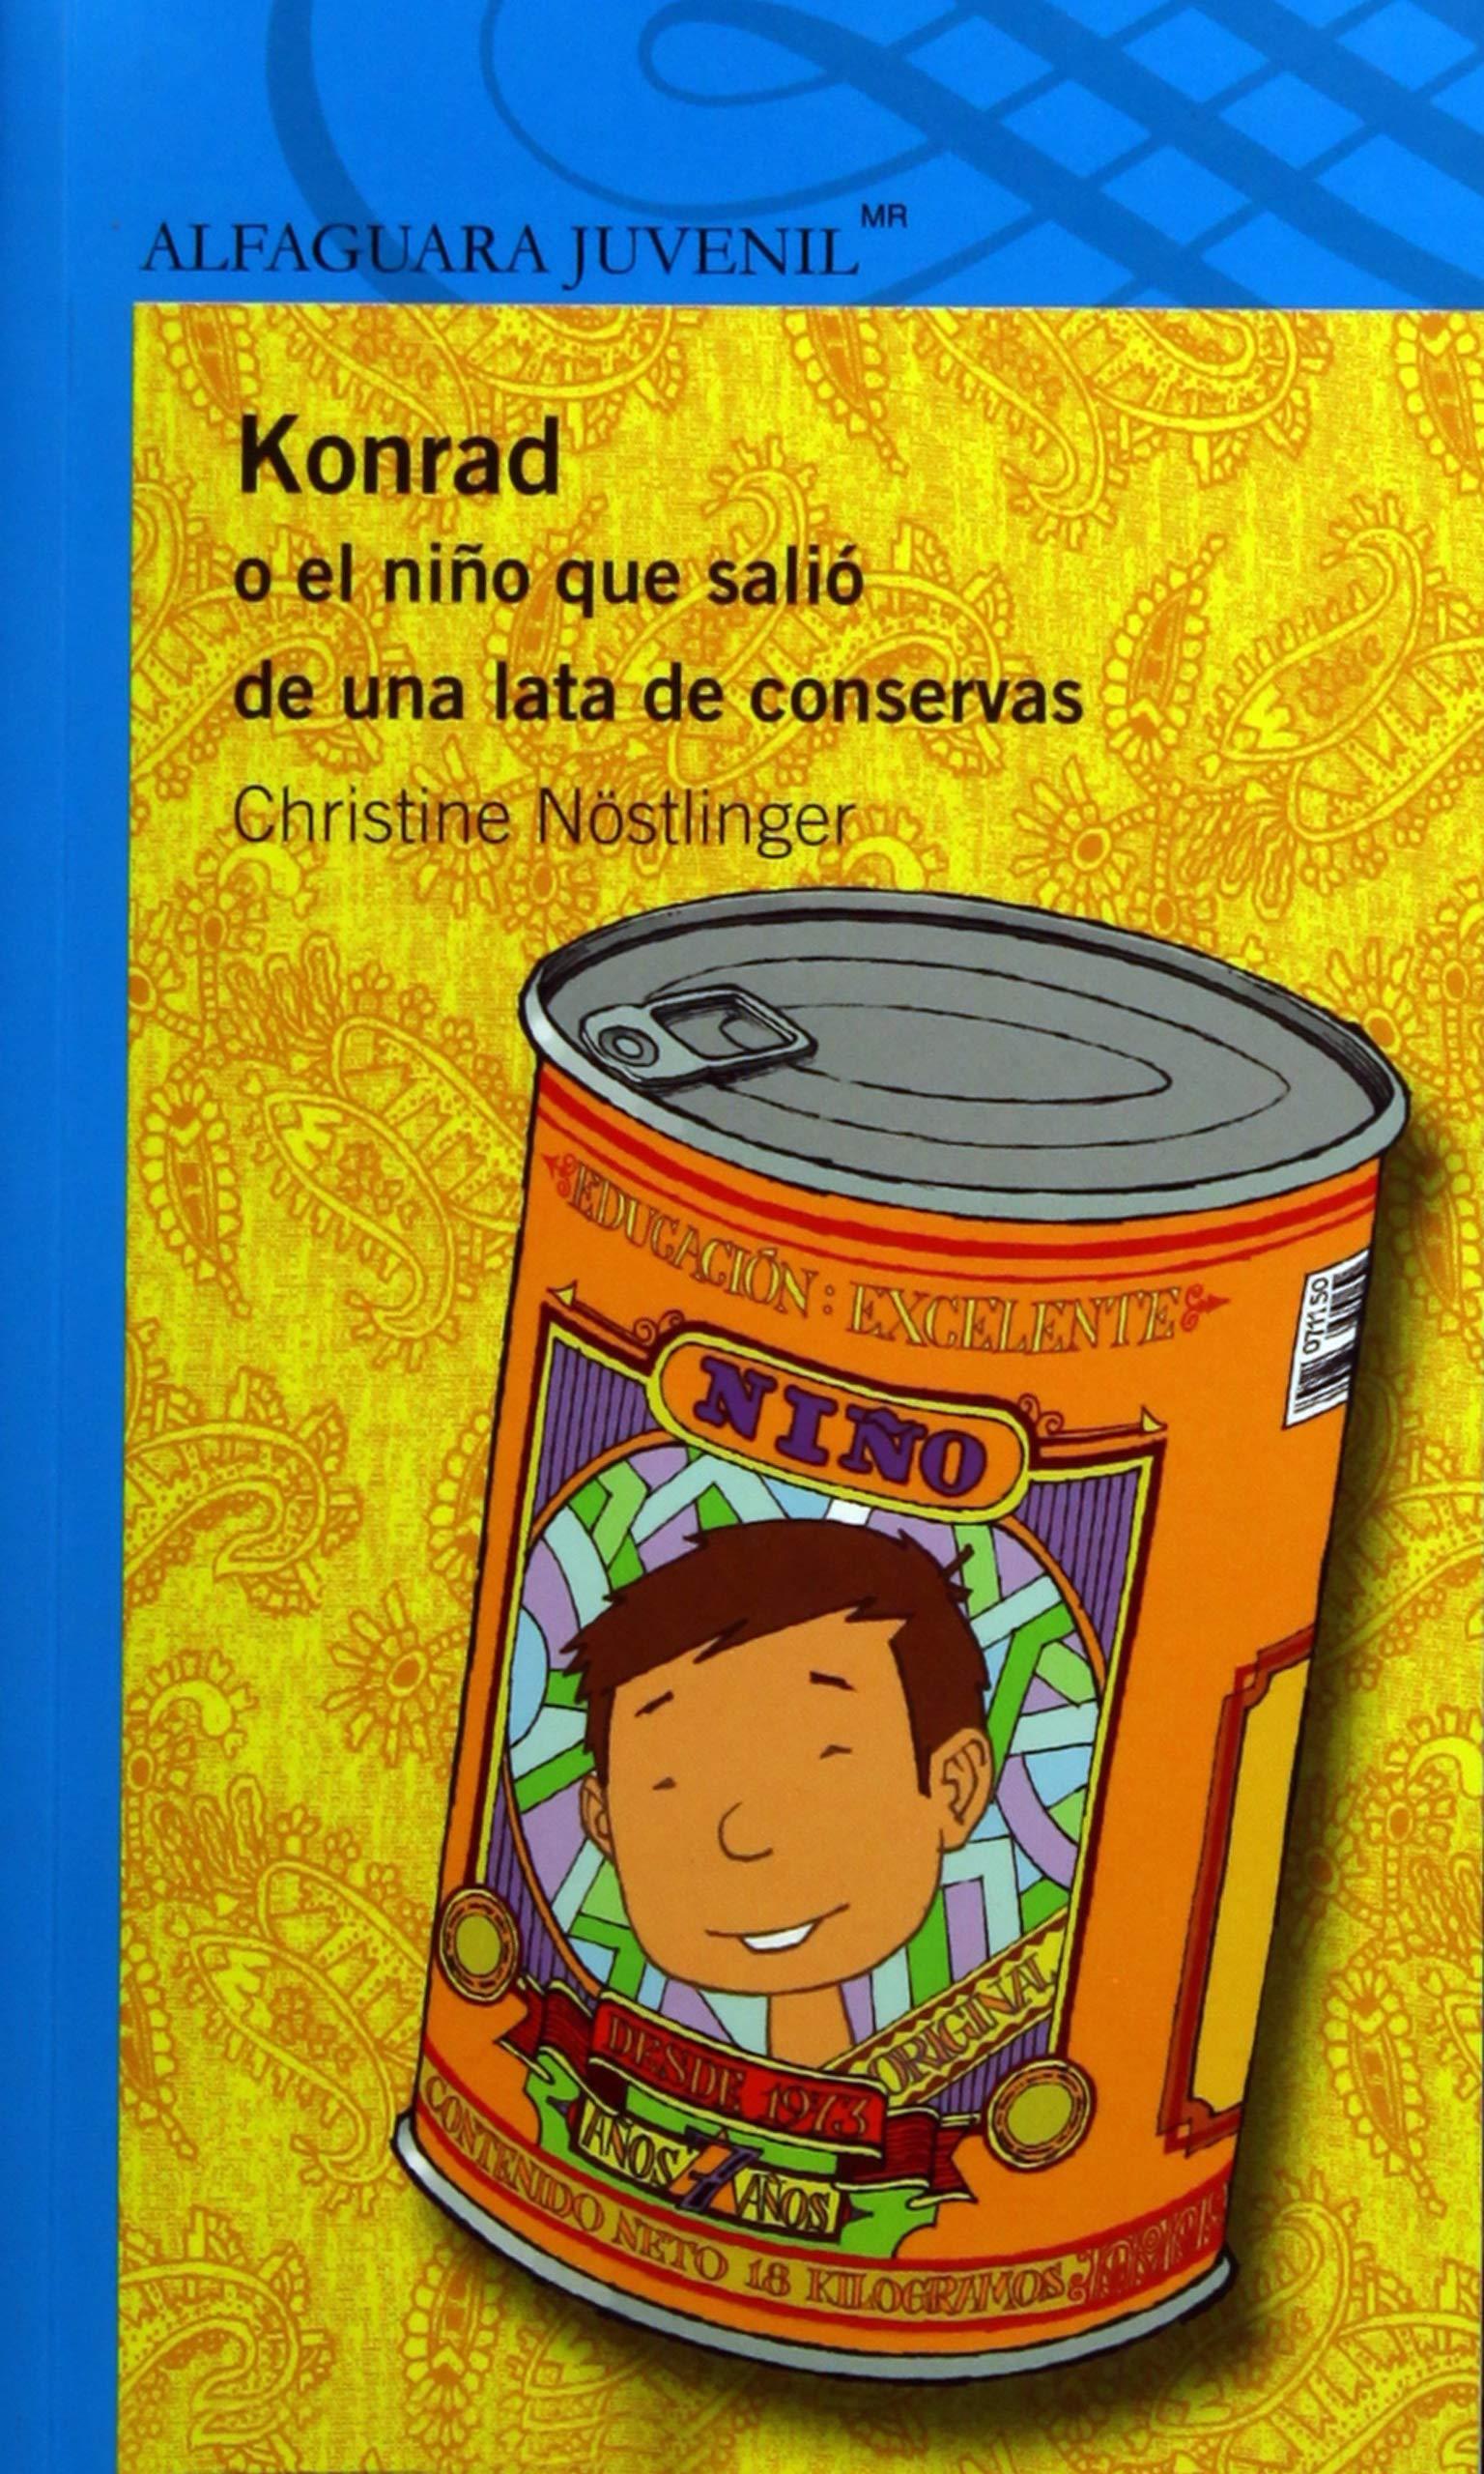 ... de conservas/ Konrad or the child came out of a tin can Alfaguara Juvenil: Amazon.es: Christine Nöstlinger, Ricardo Pélaez, Maria Jesus Ampudia: Libros